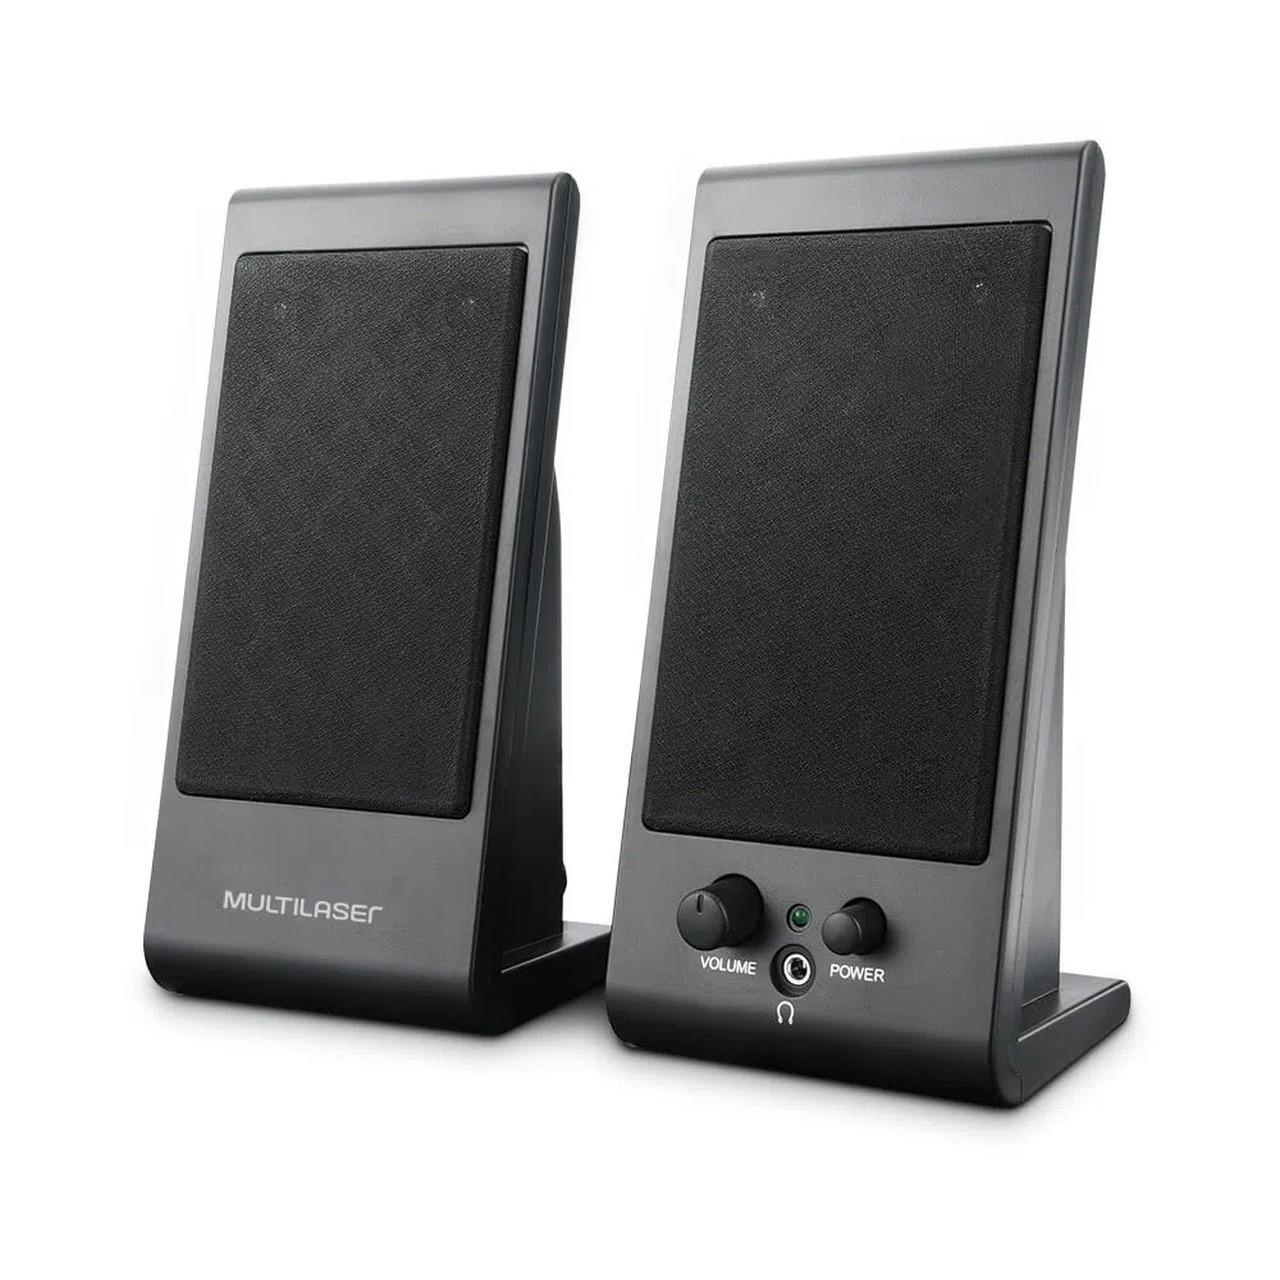 Caixa de Som 3 WRMS USB Flat Multilaser SP009